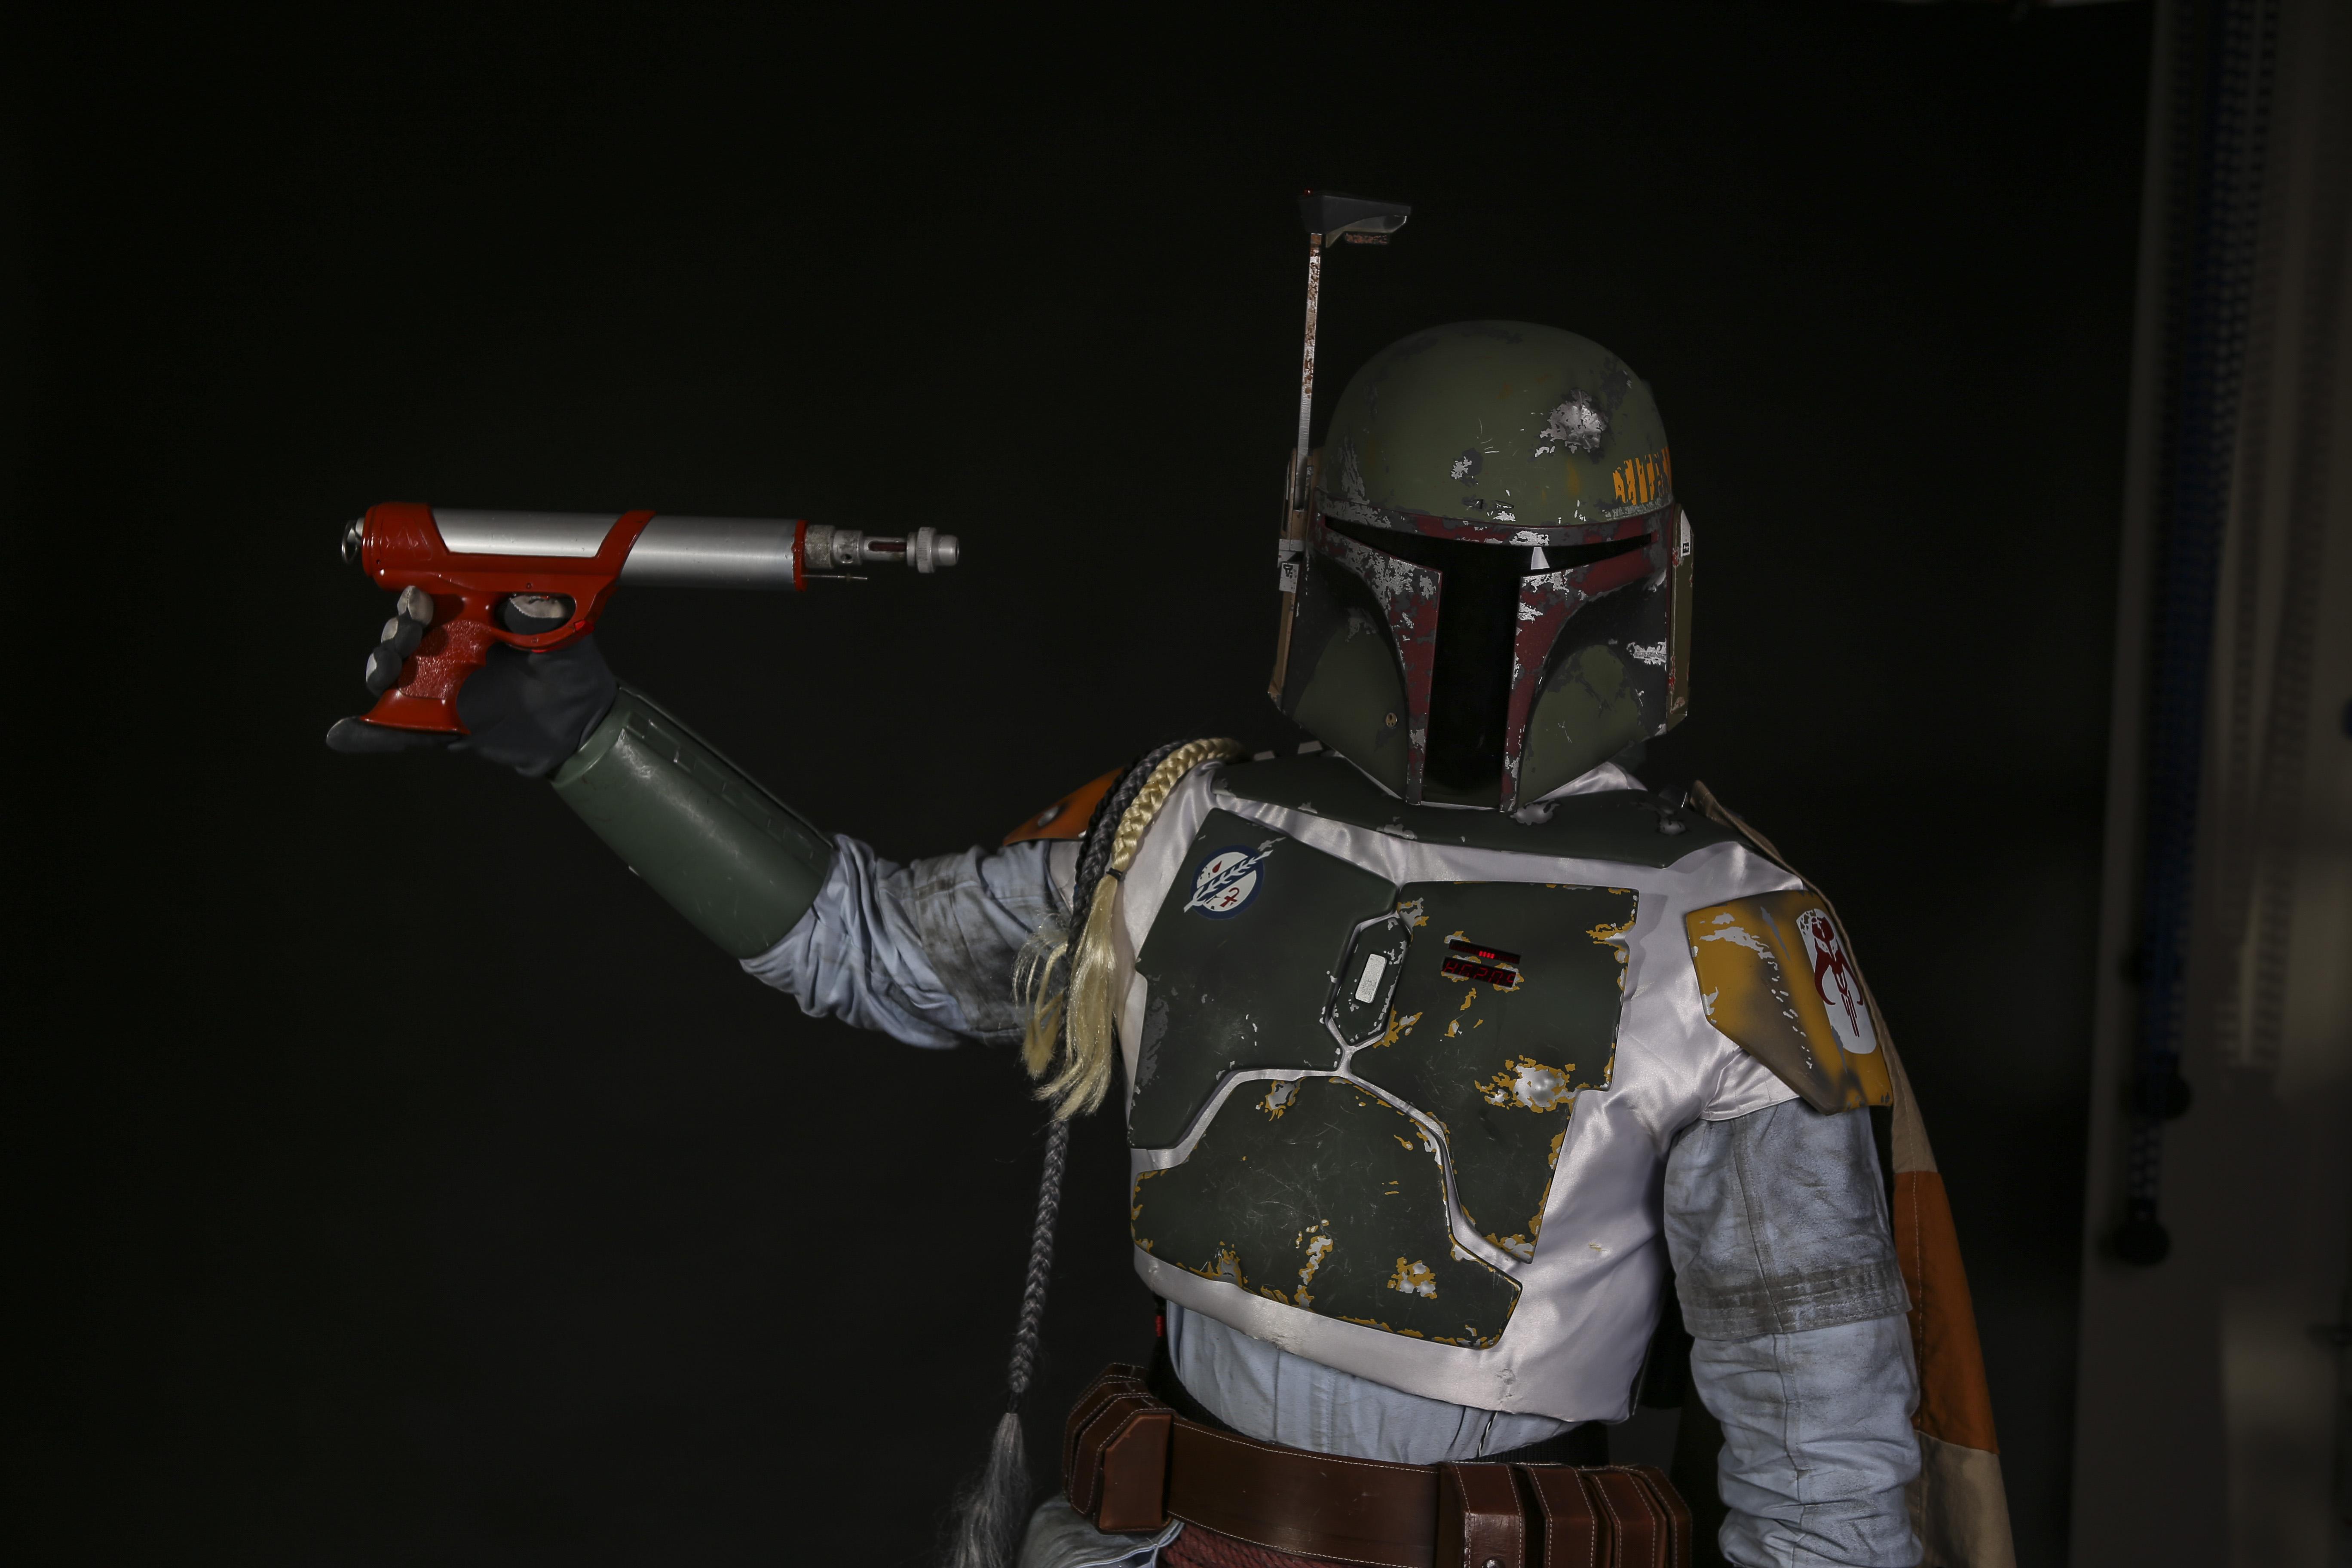 Boba Fett holding a blaster